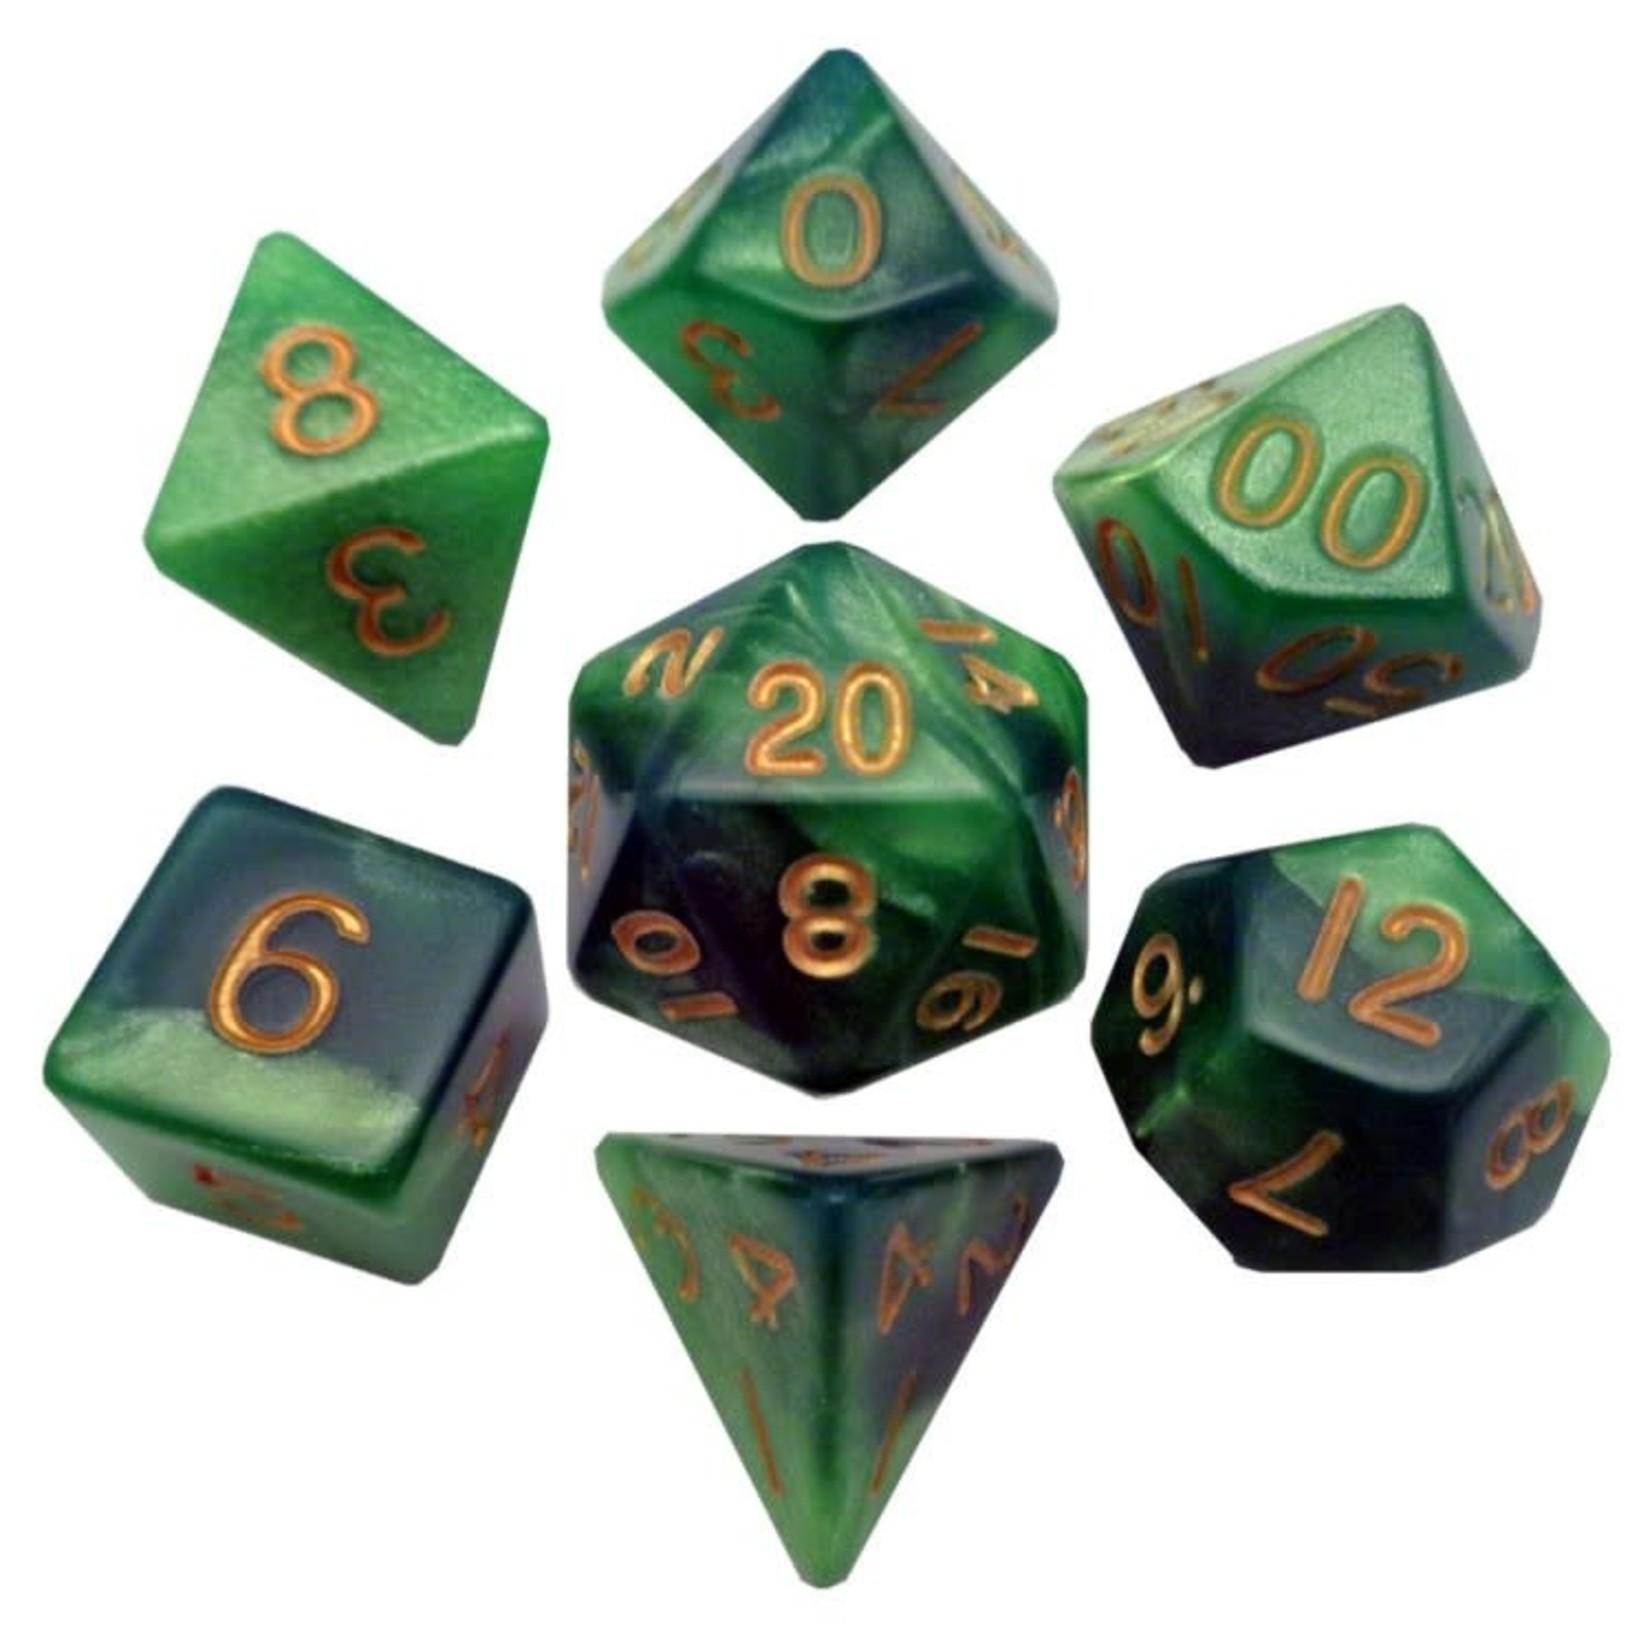 Metallic Dice Games Metallic Dice Games: 7 Set Combo Attack Green/Lt Green/Gold